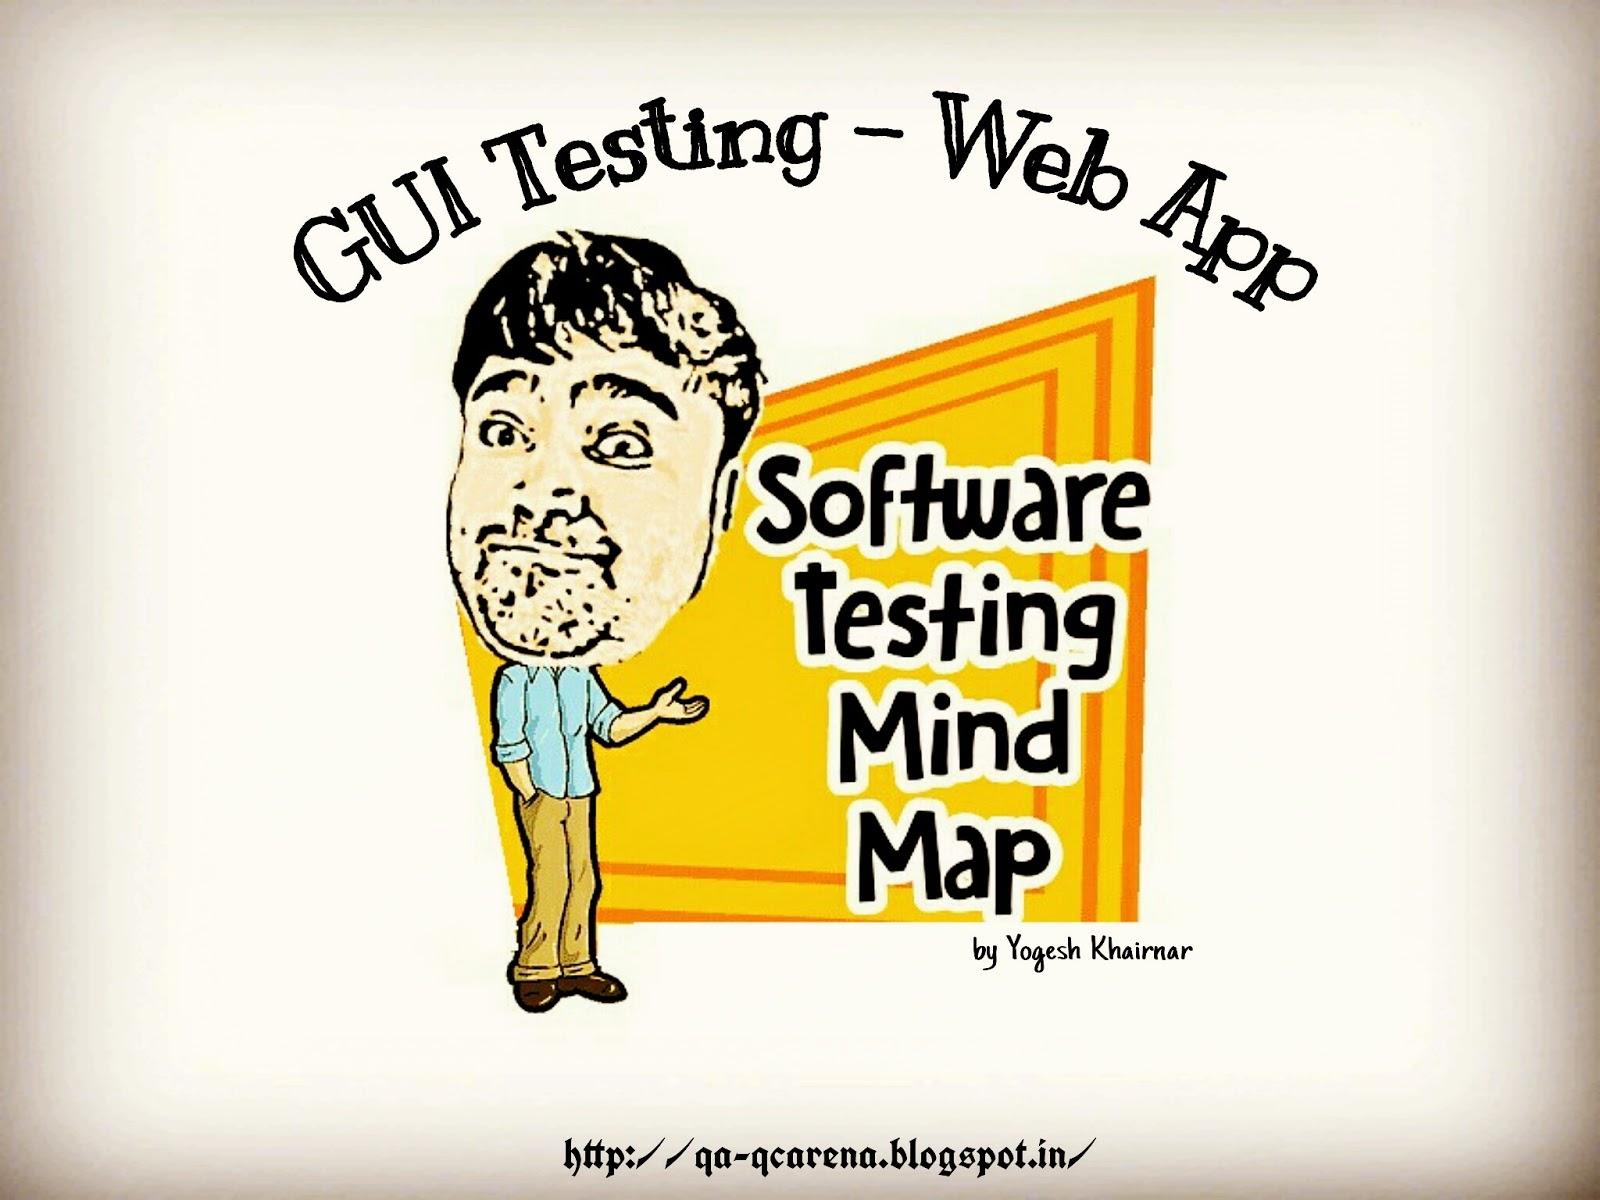 QA-QC Arena: Software Testing Mind Maps – GUI Testing-Web Applications